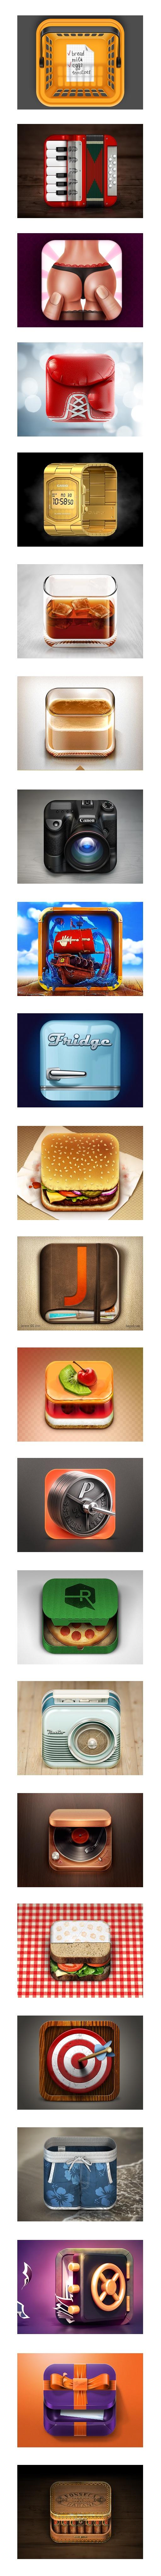 Stunning App Design